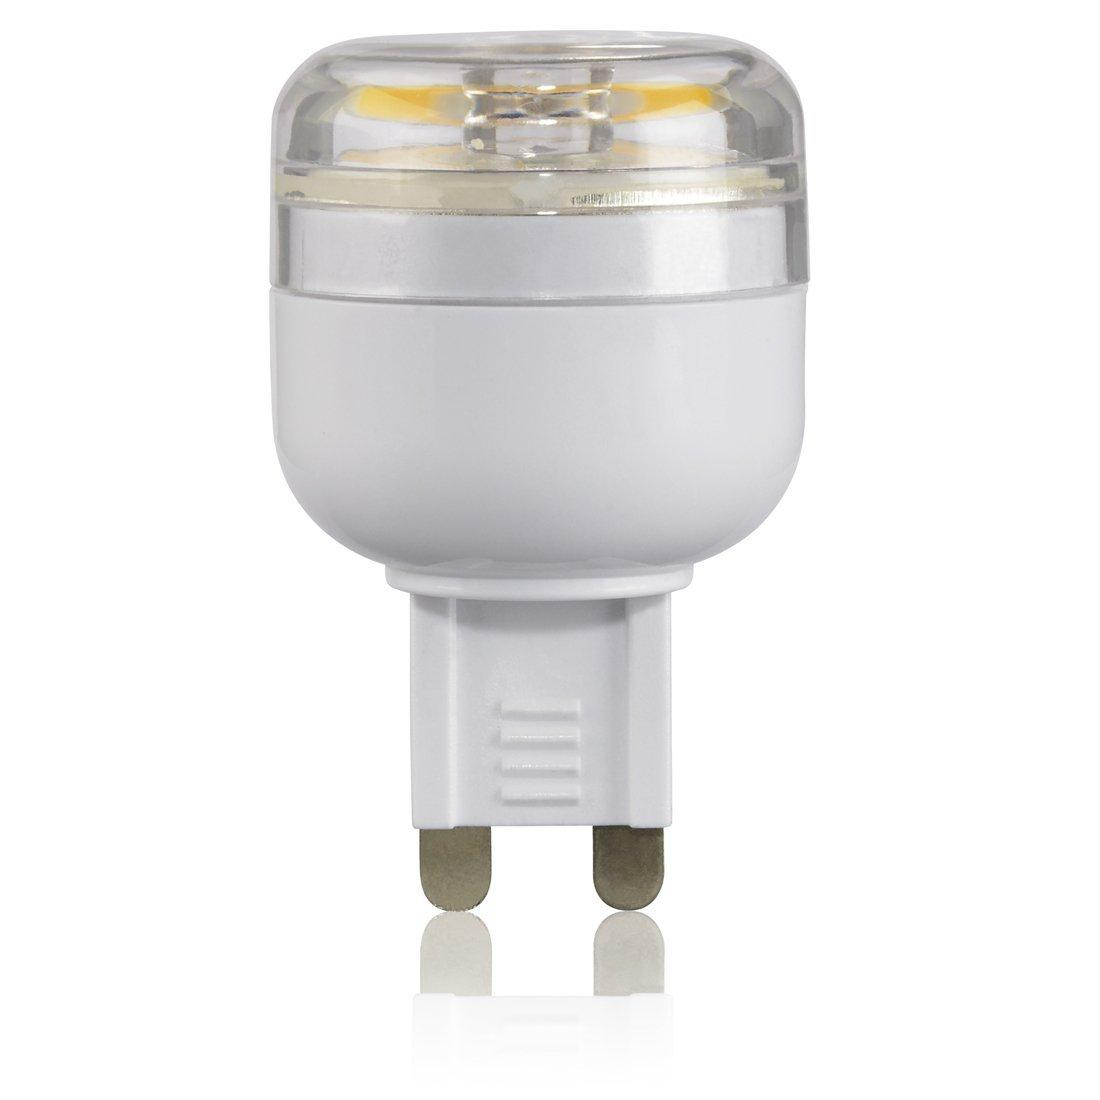 Xavax led lampe g9 25w ersetzt 22w 210 lm warmwei amazon hv led lampe g9 parisarafo Images